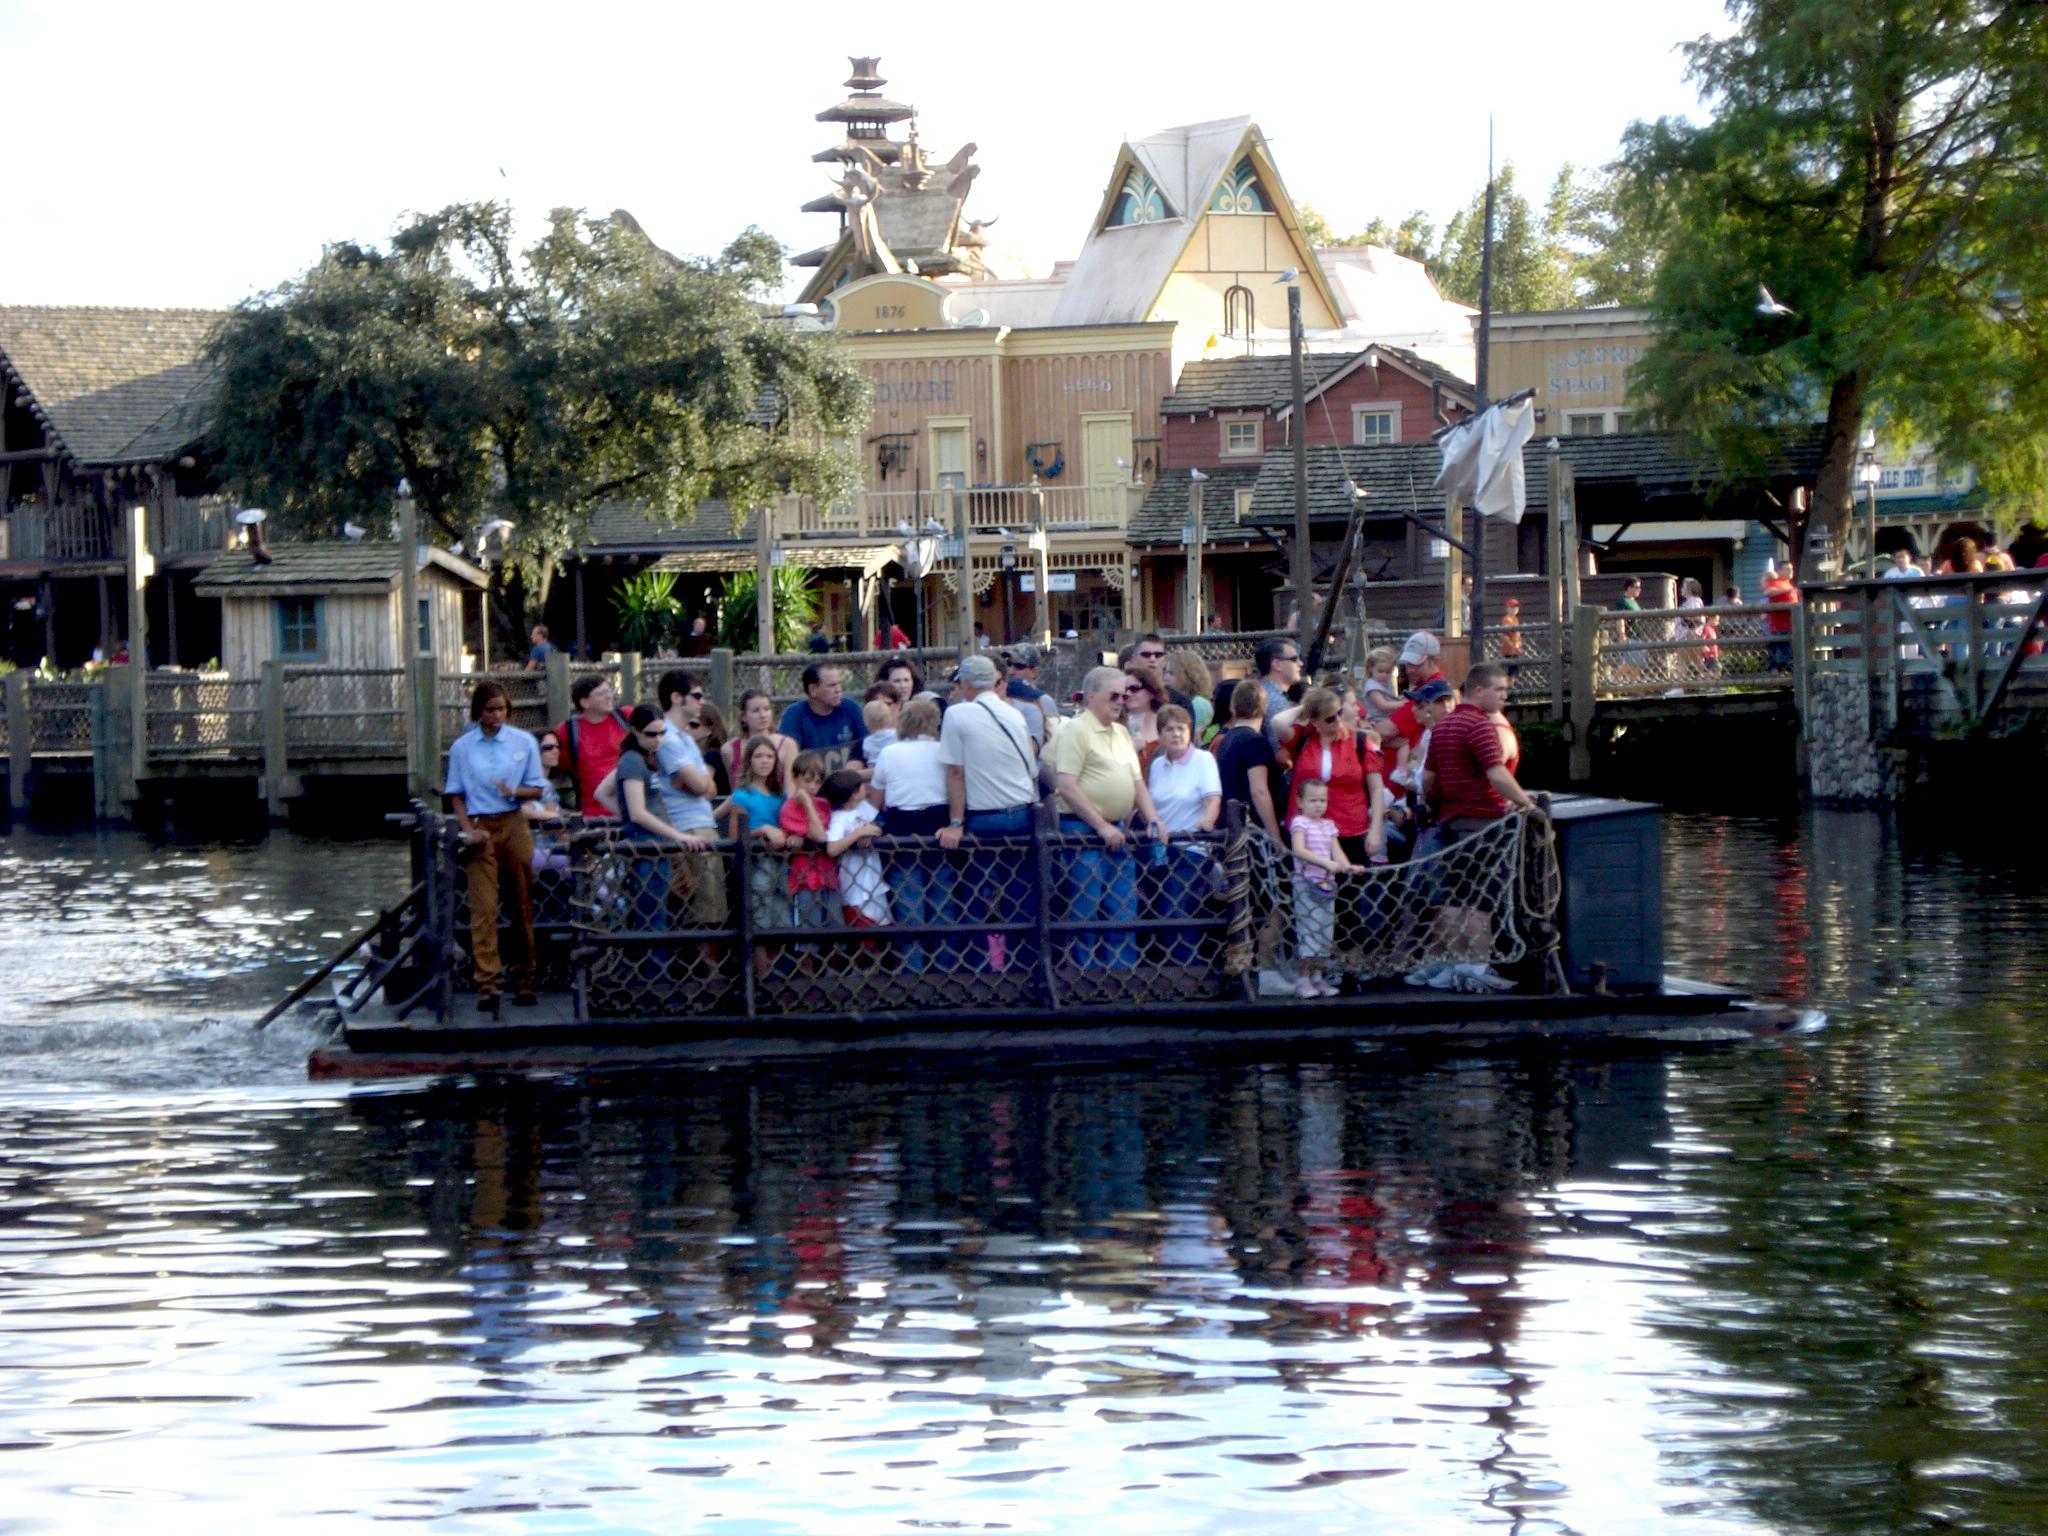 Raft to Tom Sawyer Island in Magic Kingdom at Disney World